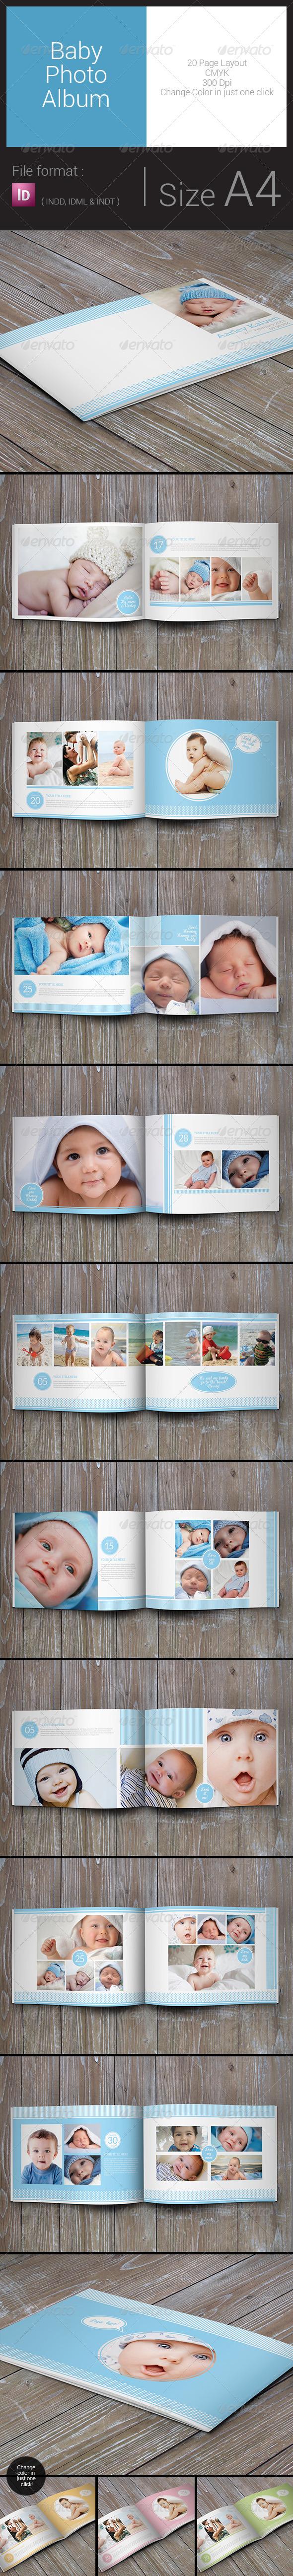 Baby Photo Album - Print Templates Download here: https ...